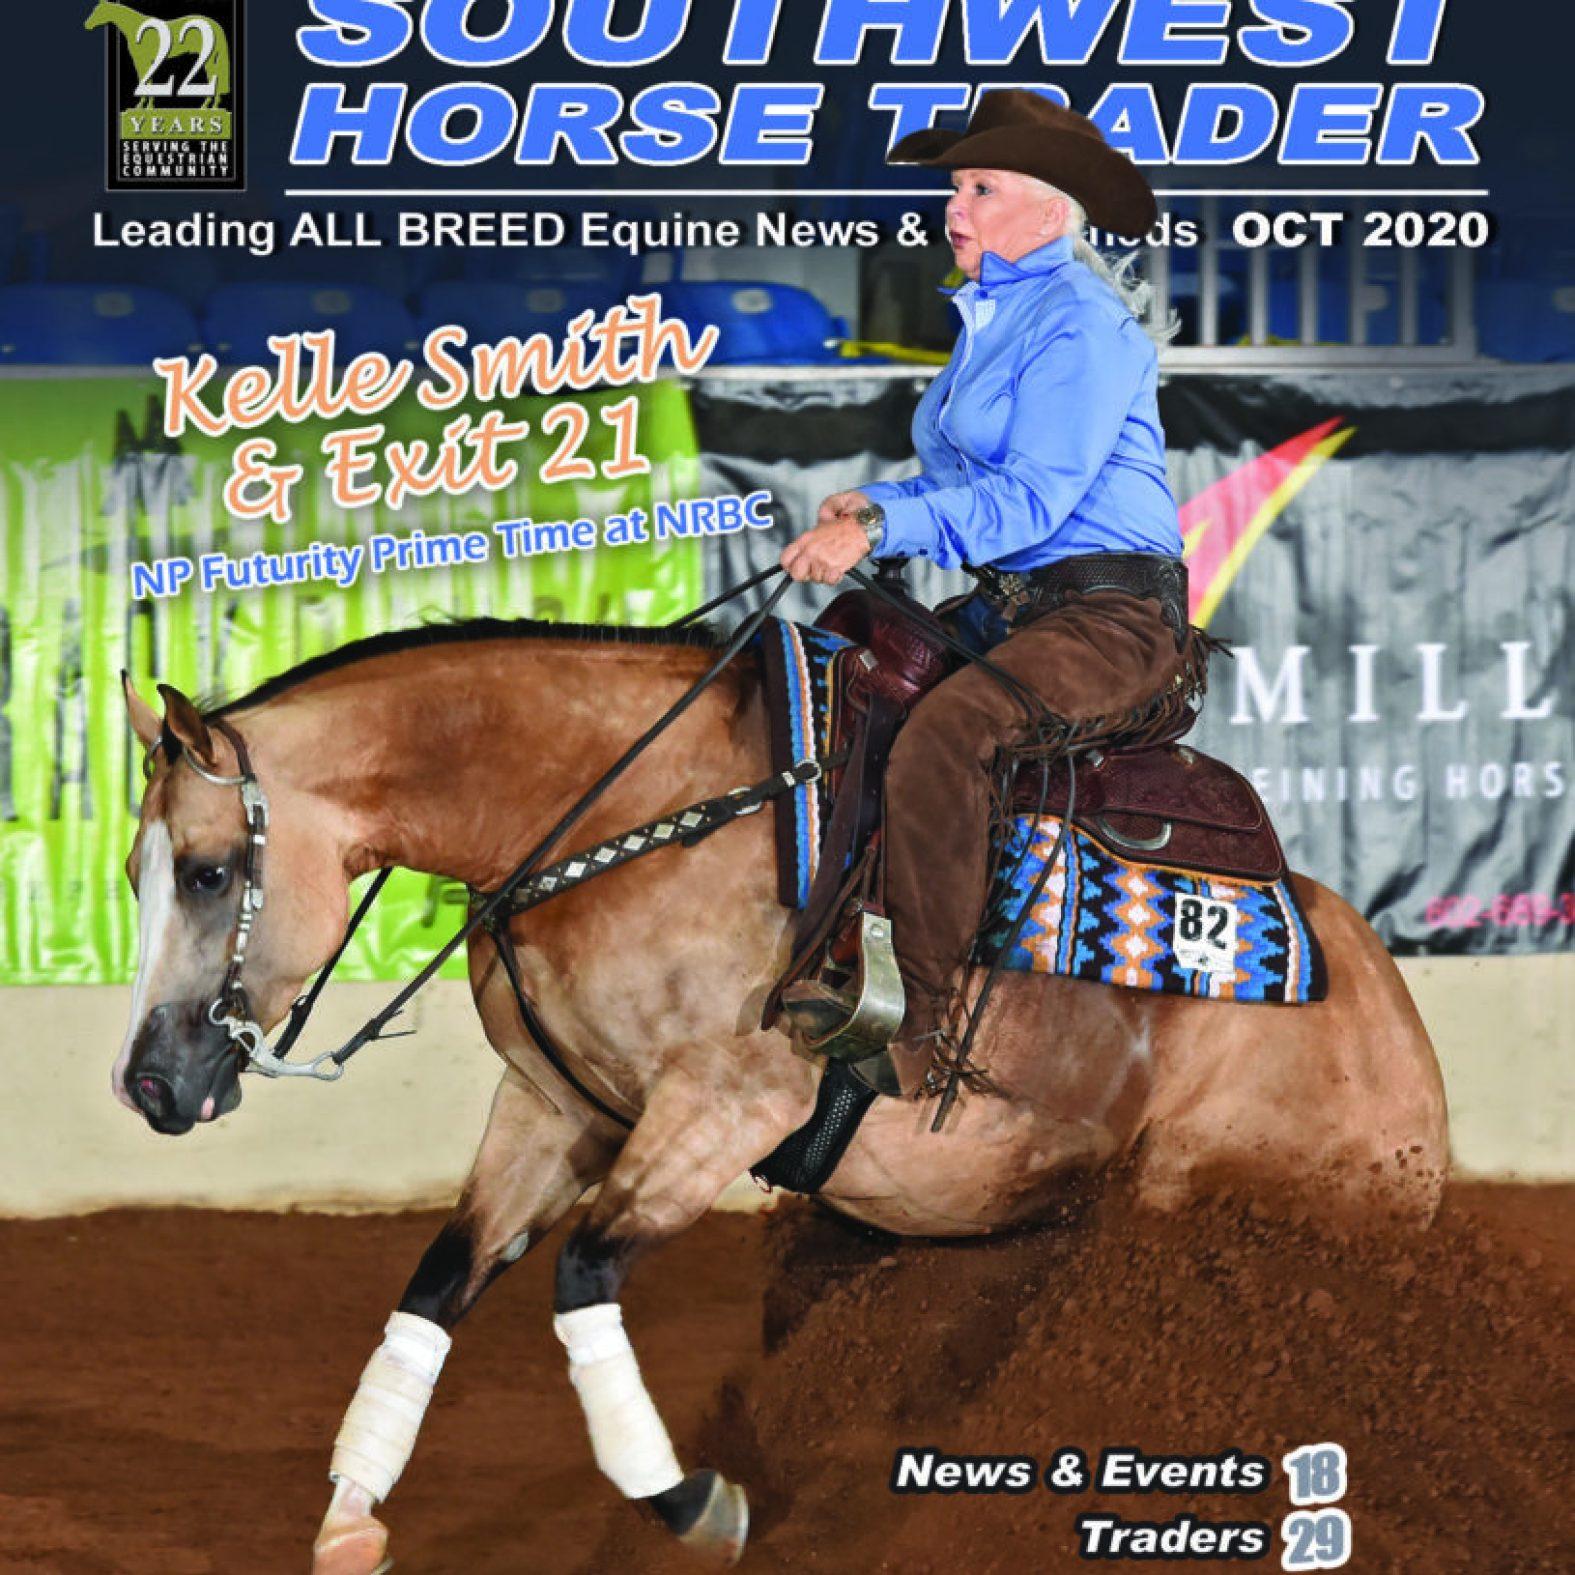 SouthWest Horse Trader October 2020 Issue